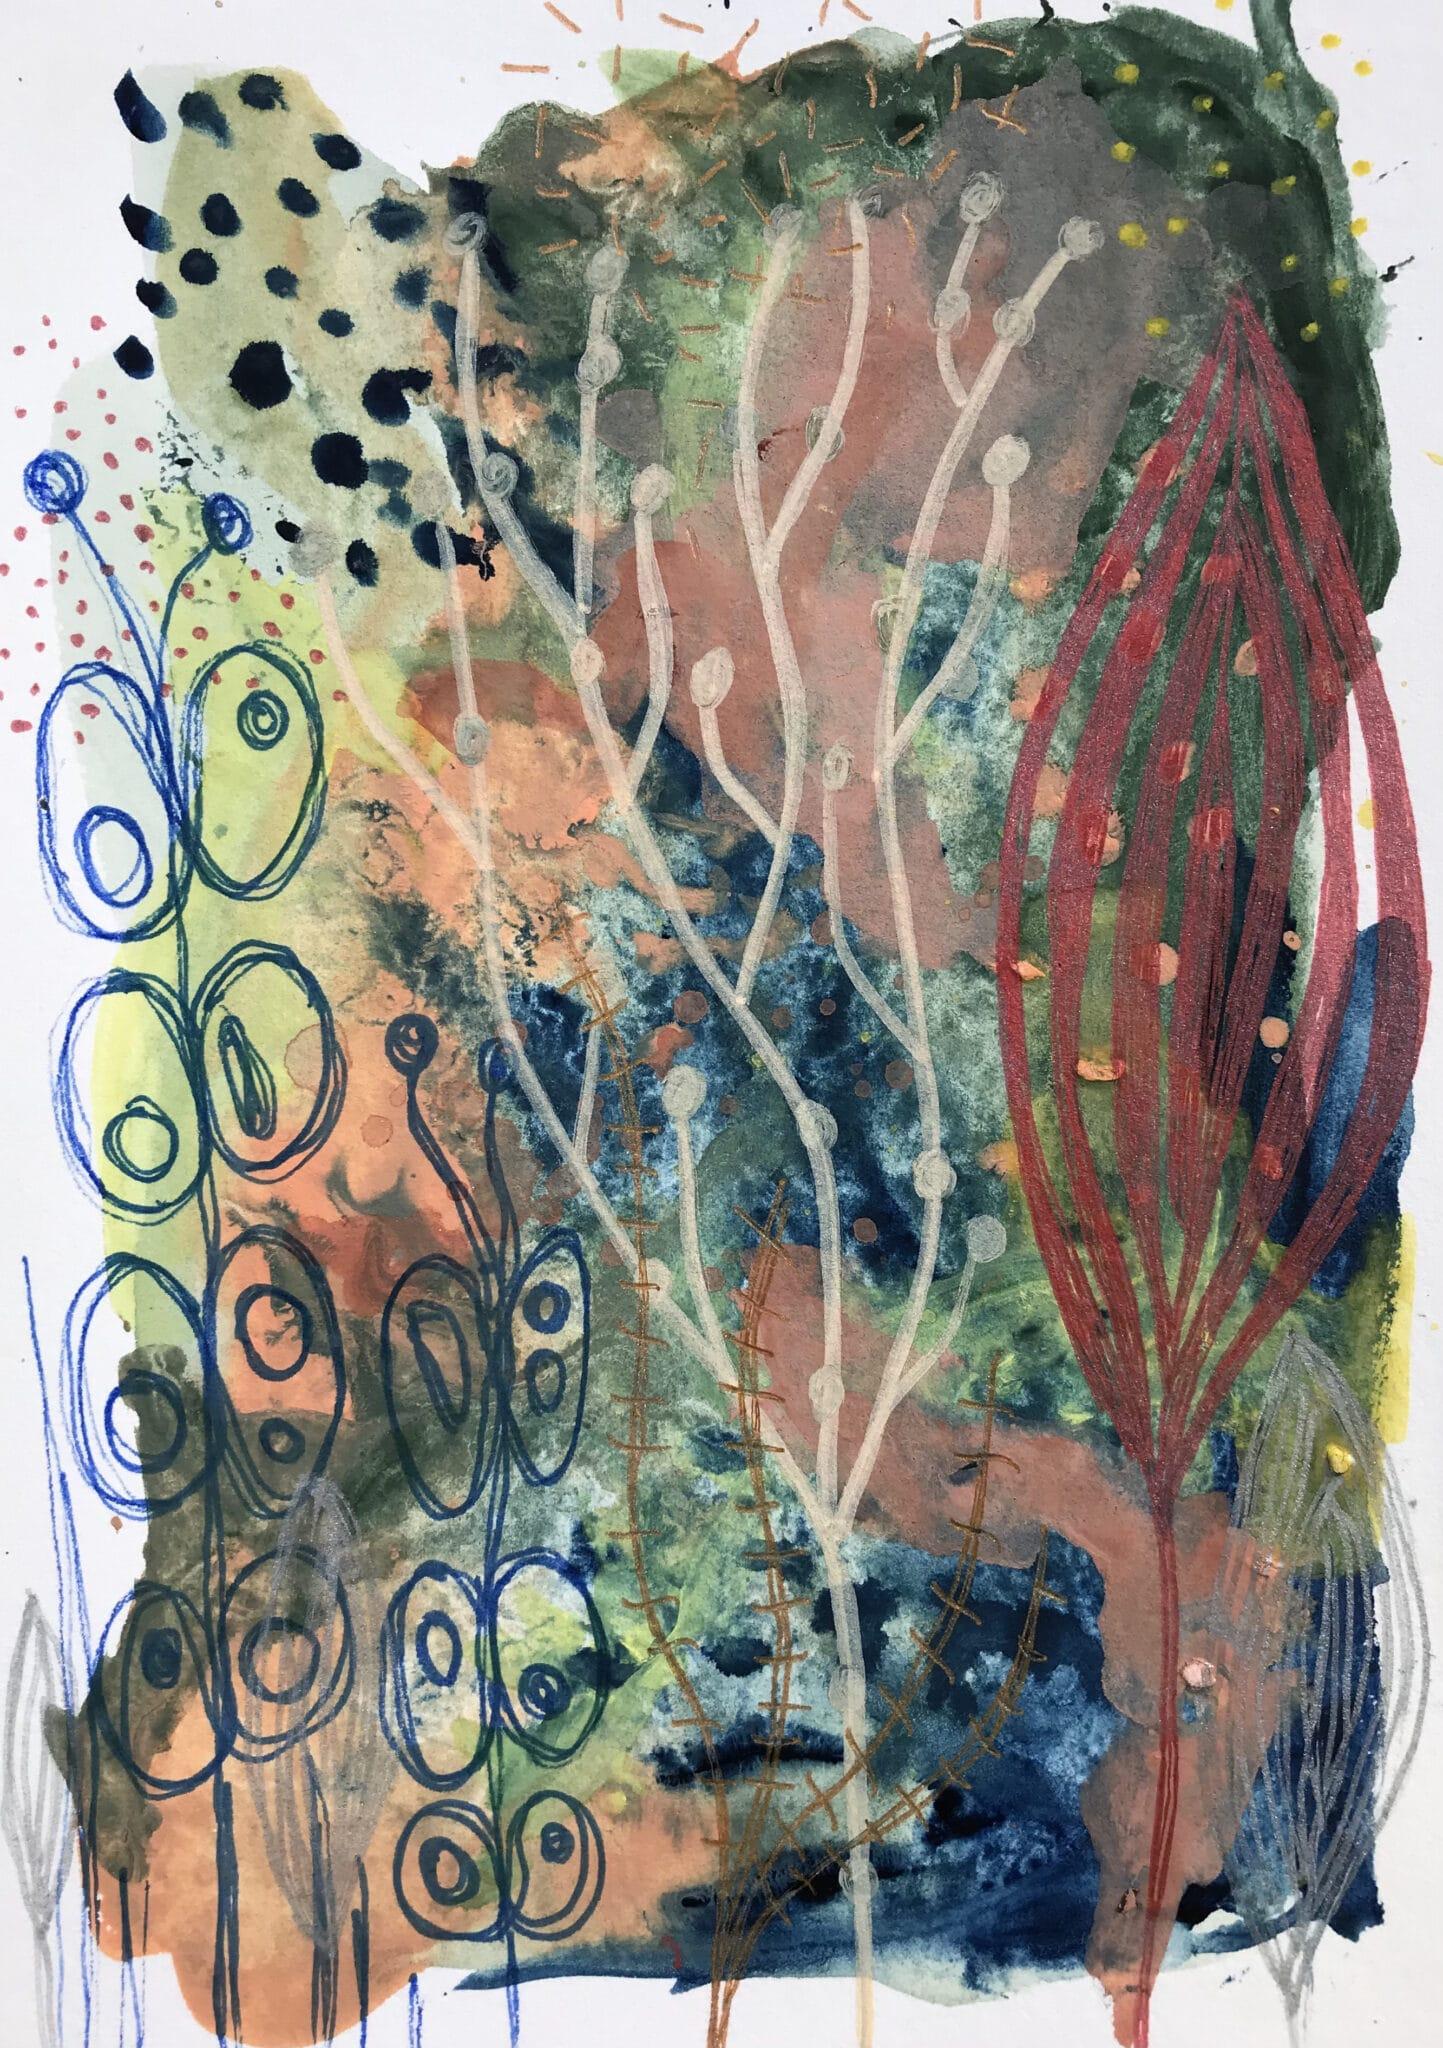 Grow With Me Set 1 – Mixed Media Original Artwork By Tish Willo Creative